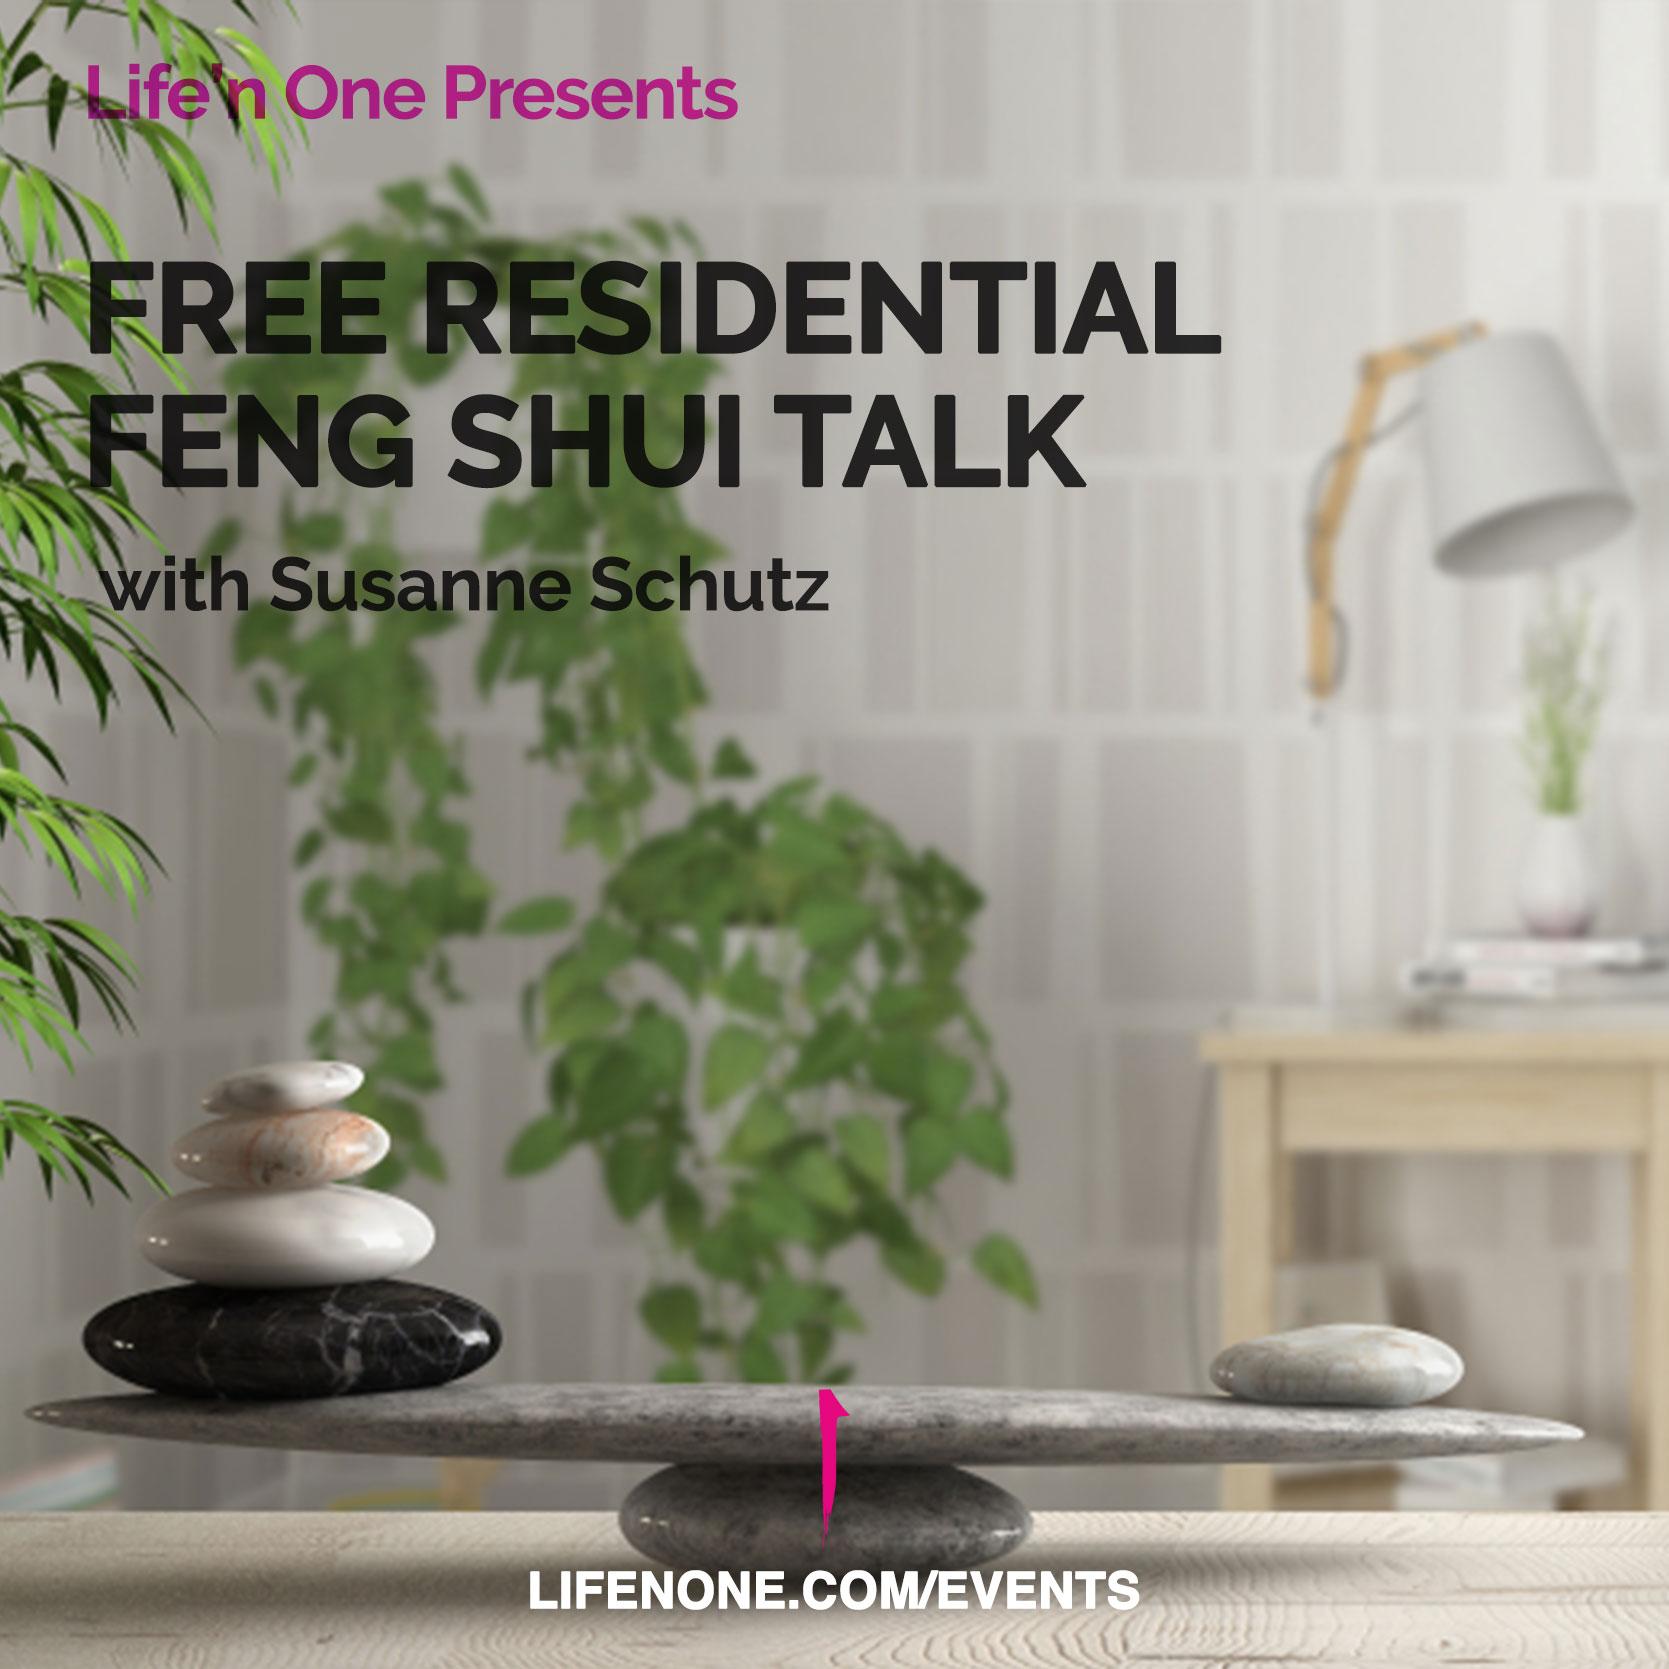 free-residential-feng-shui-talk.jpg